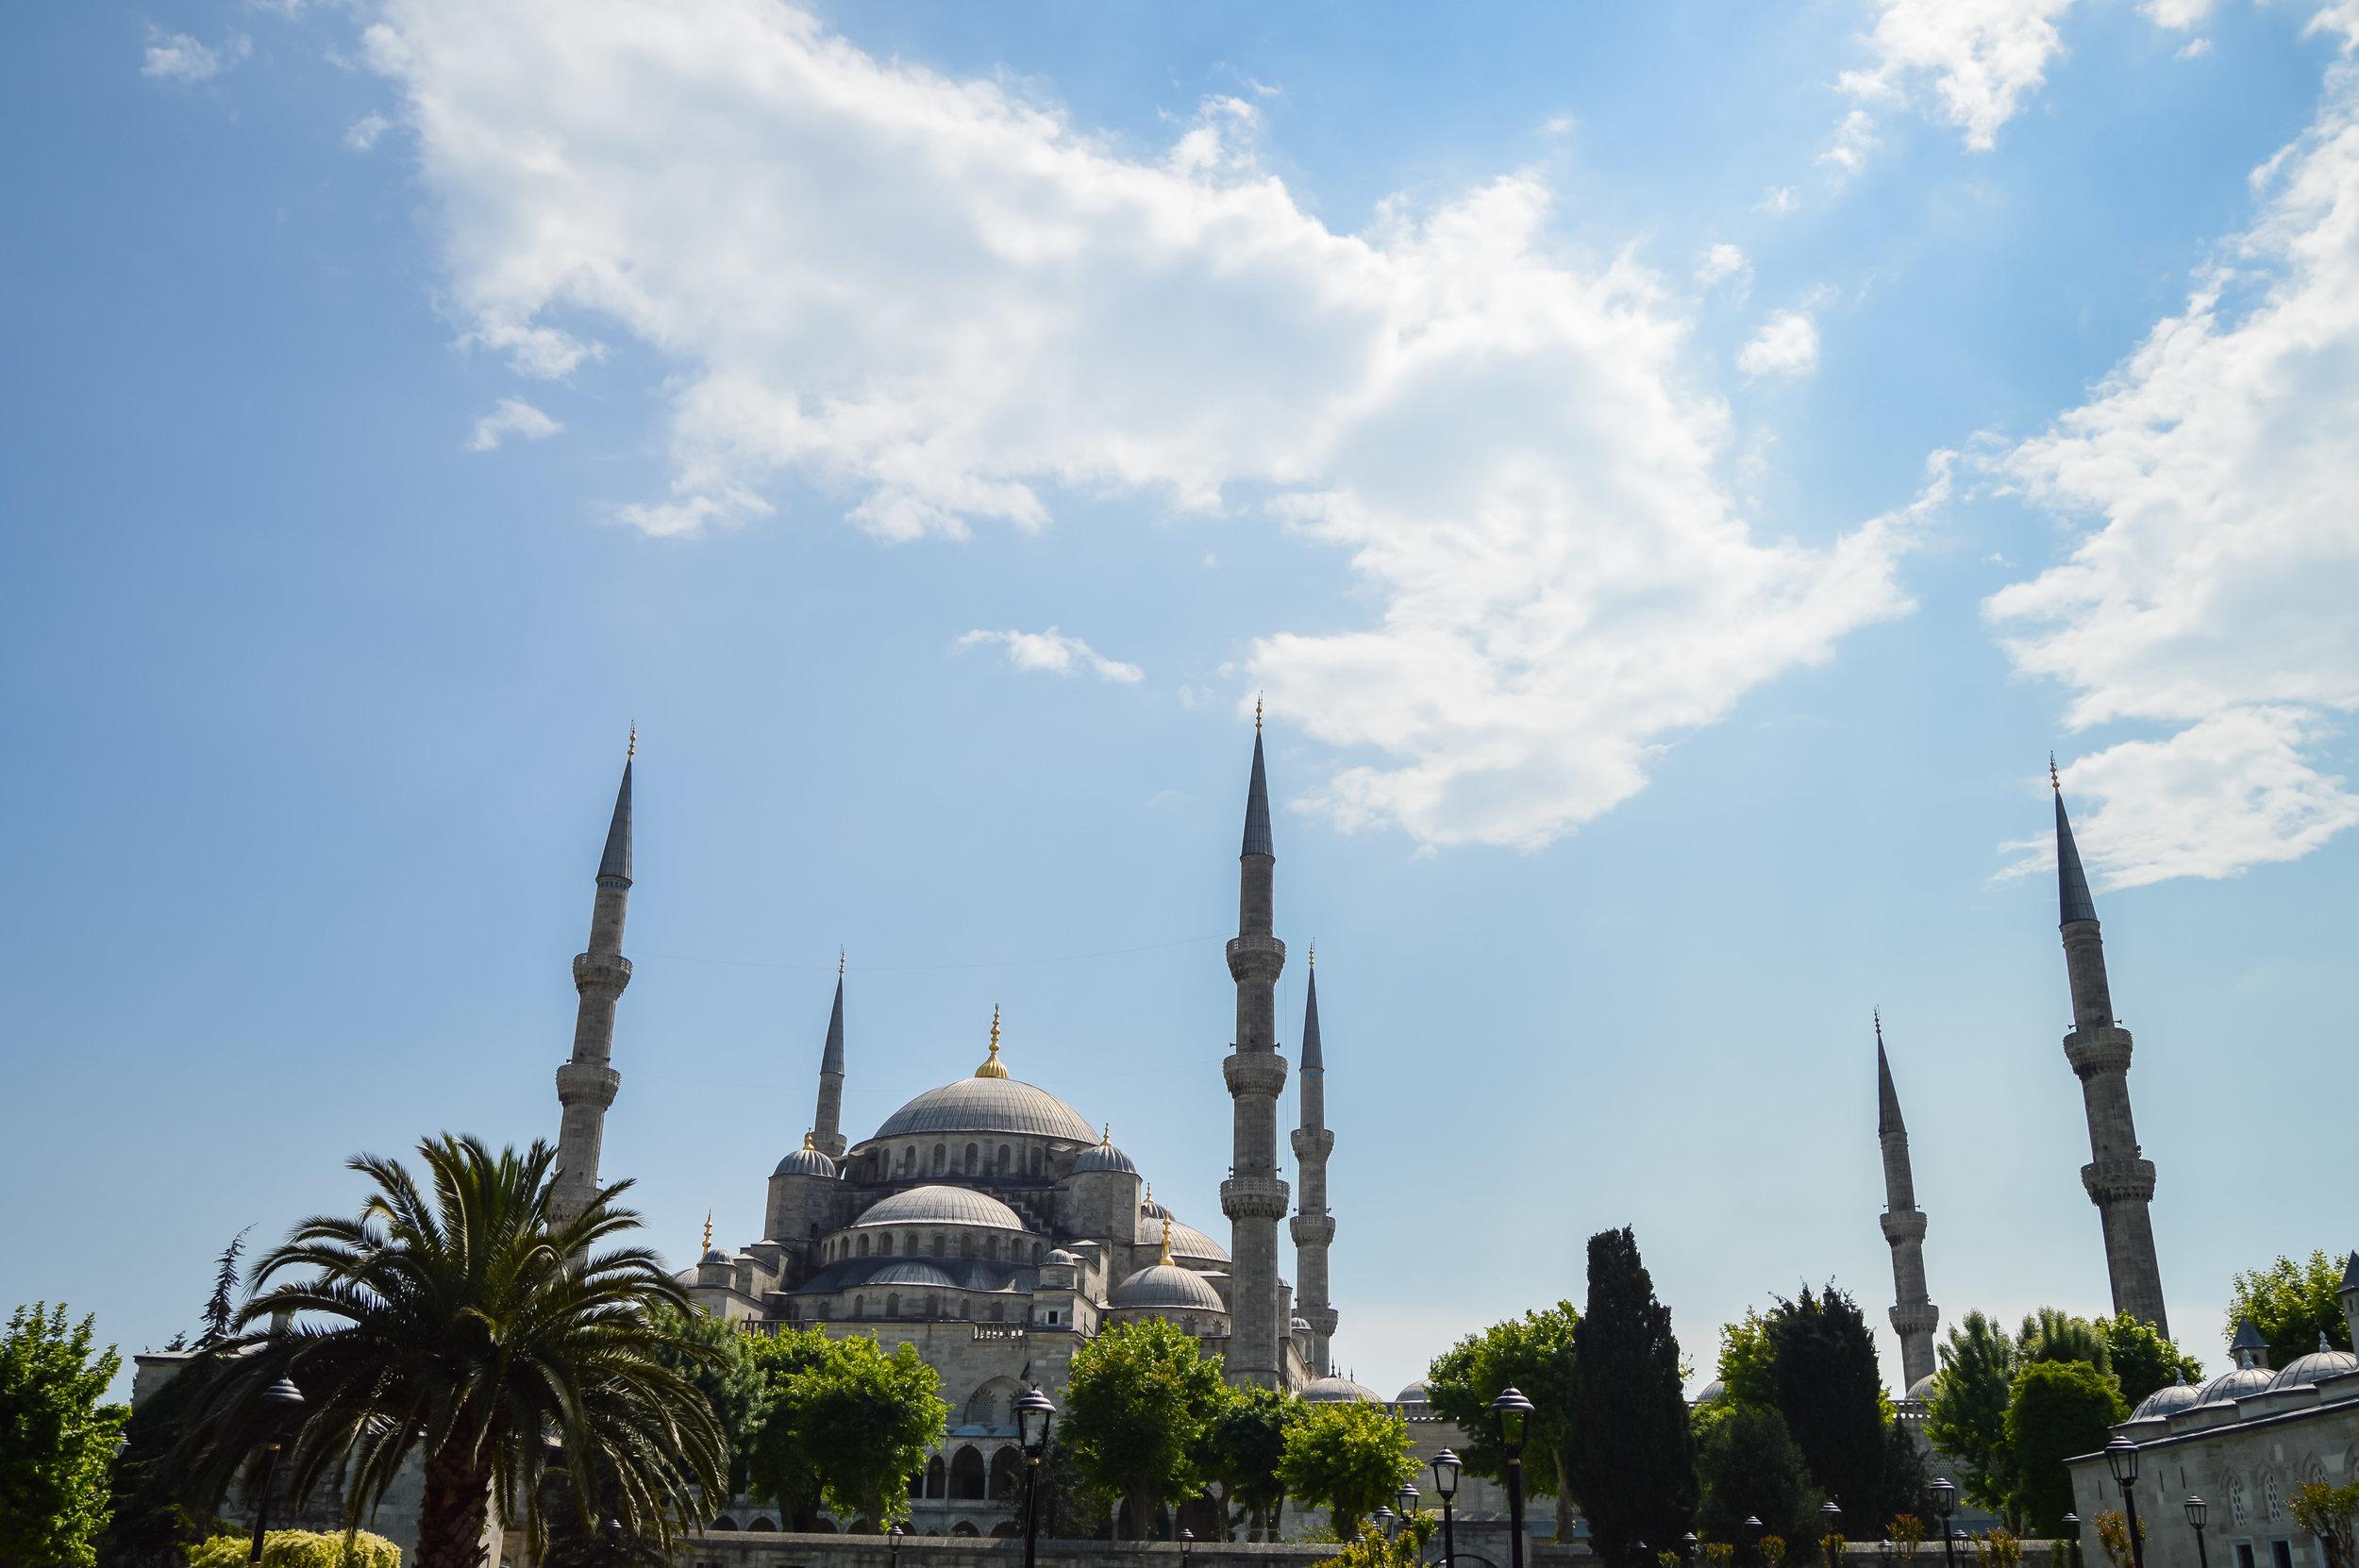 Blue Mosque Minaret Symmetry Sun Blue Sky Blue Mosque Muslim Ottoman Empire Architecture Istanbul Turkey